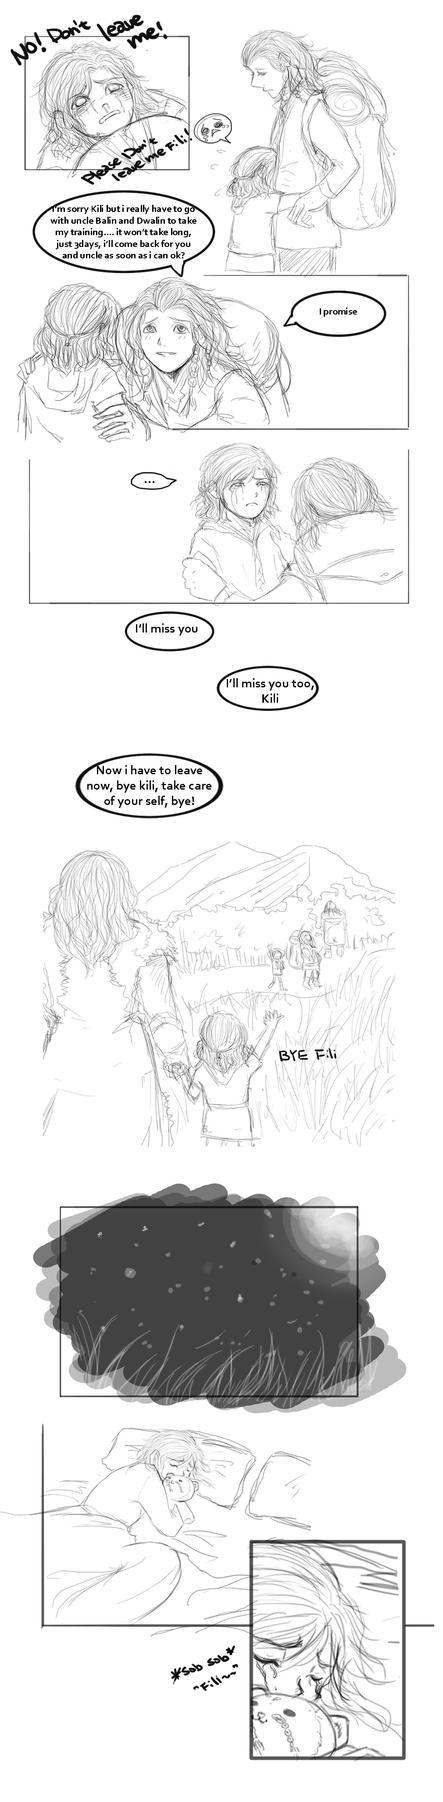 Kili's Teddy Bear Story (2/4) by youyanwuzhu